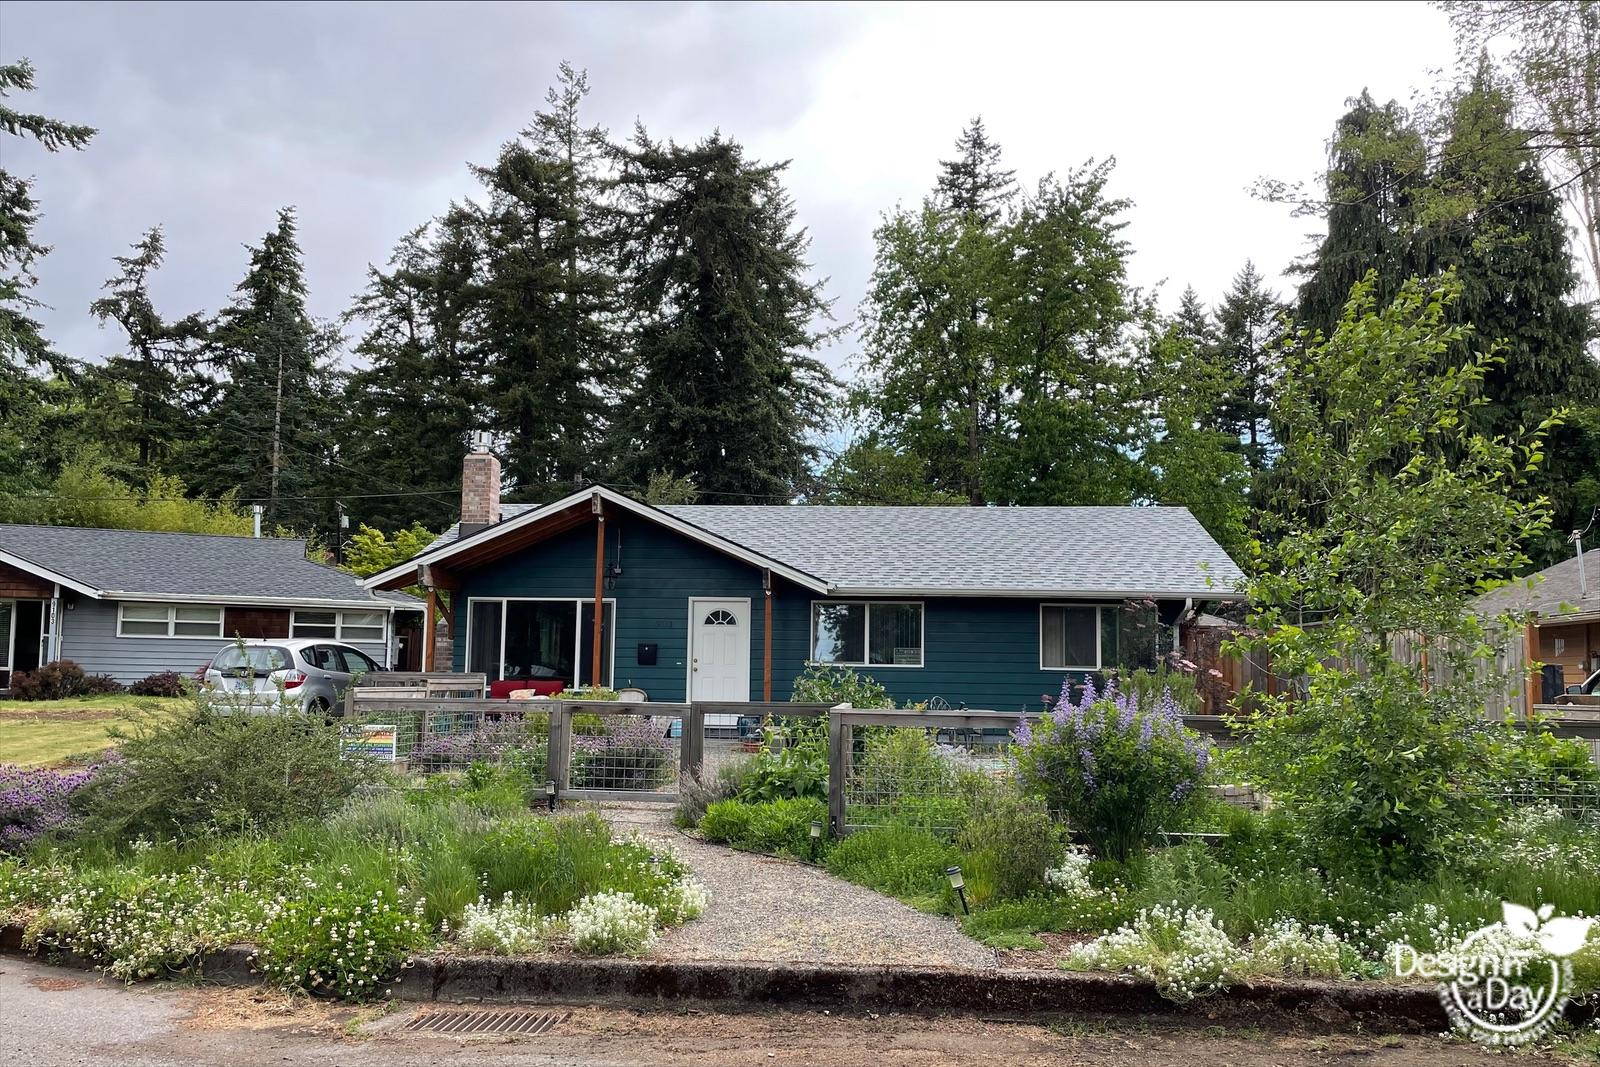 Wildlife friendly Portland front yard landscape design with pollinator loving plants.